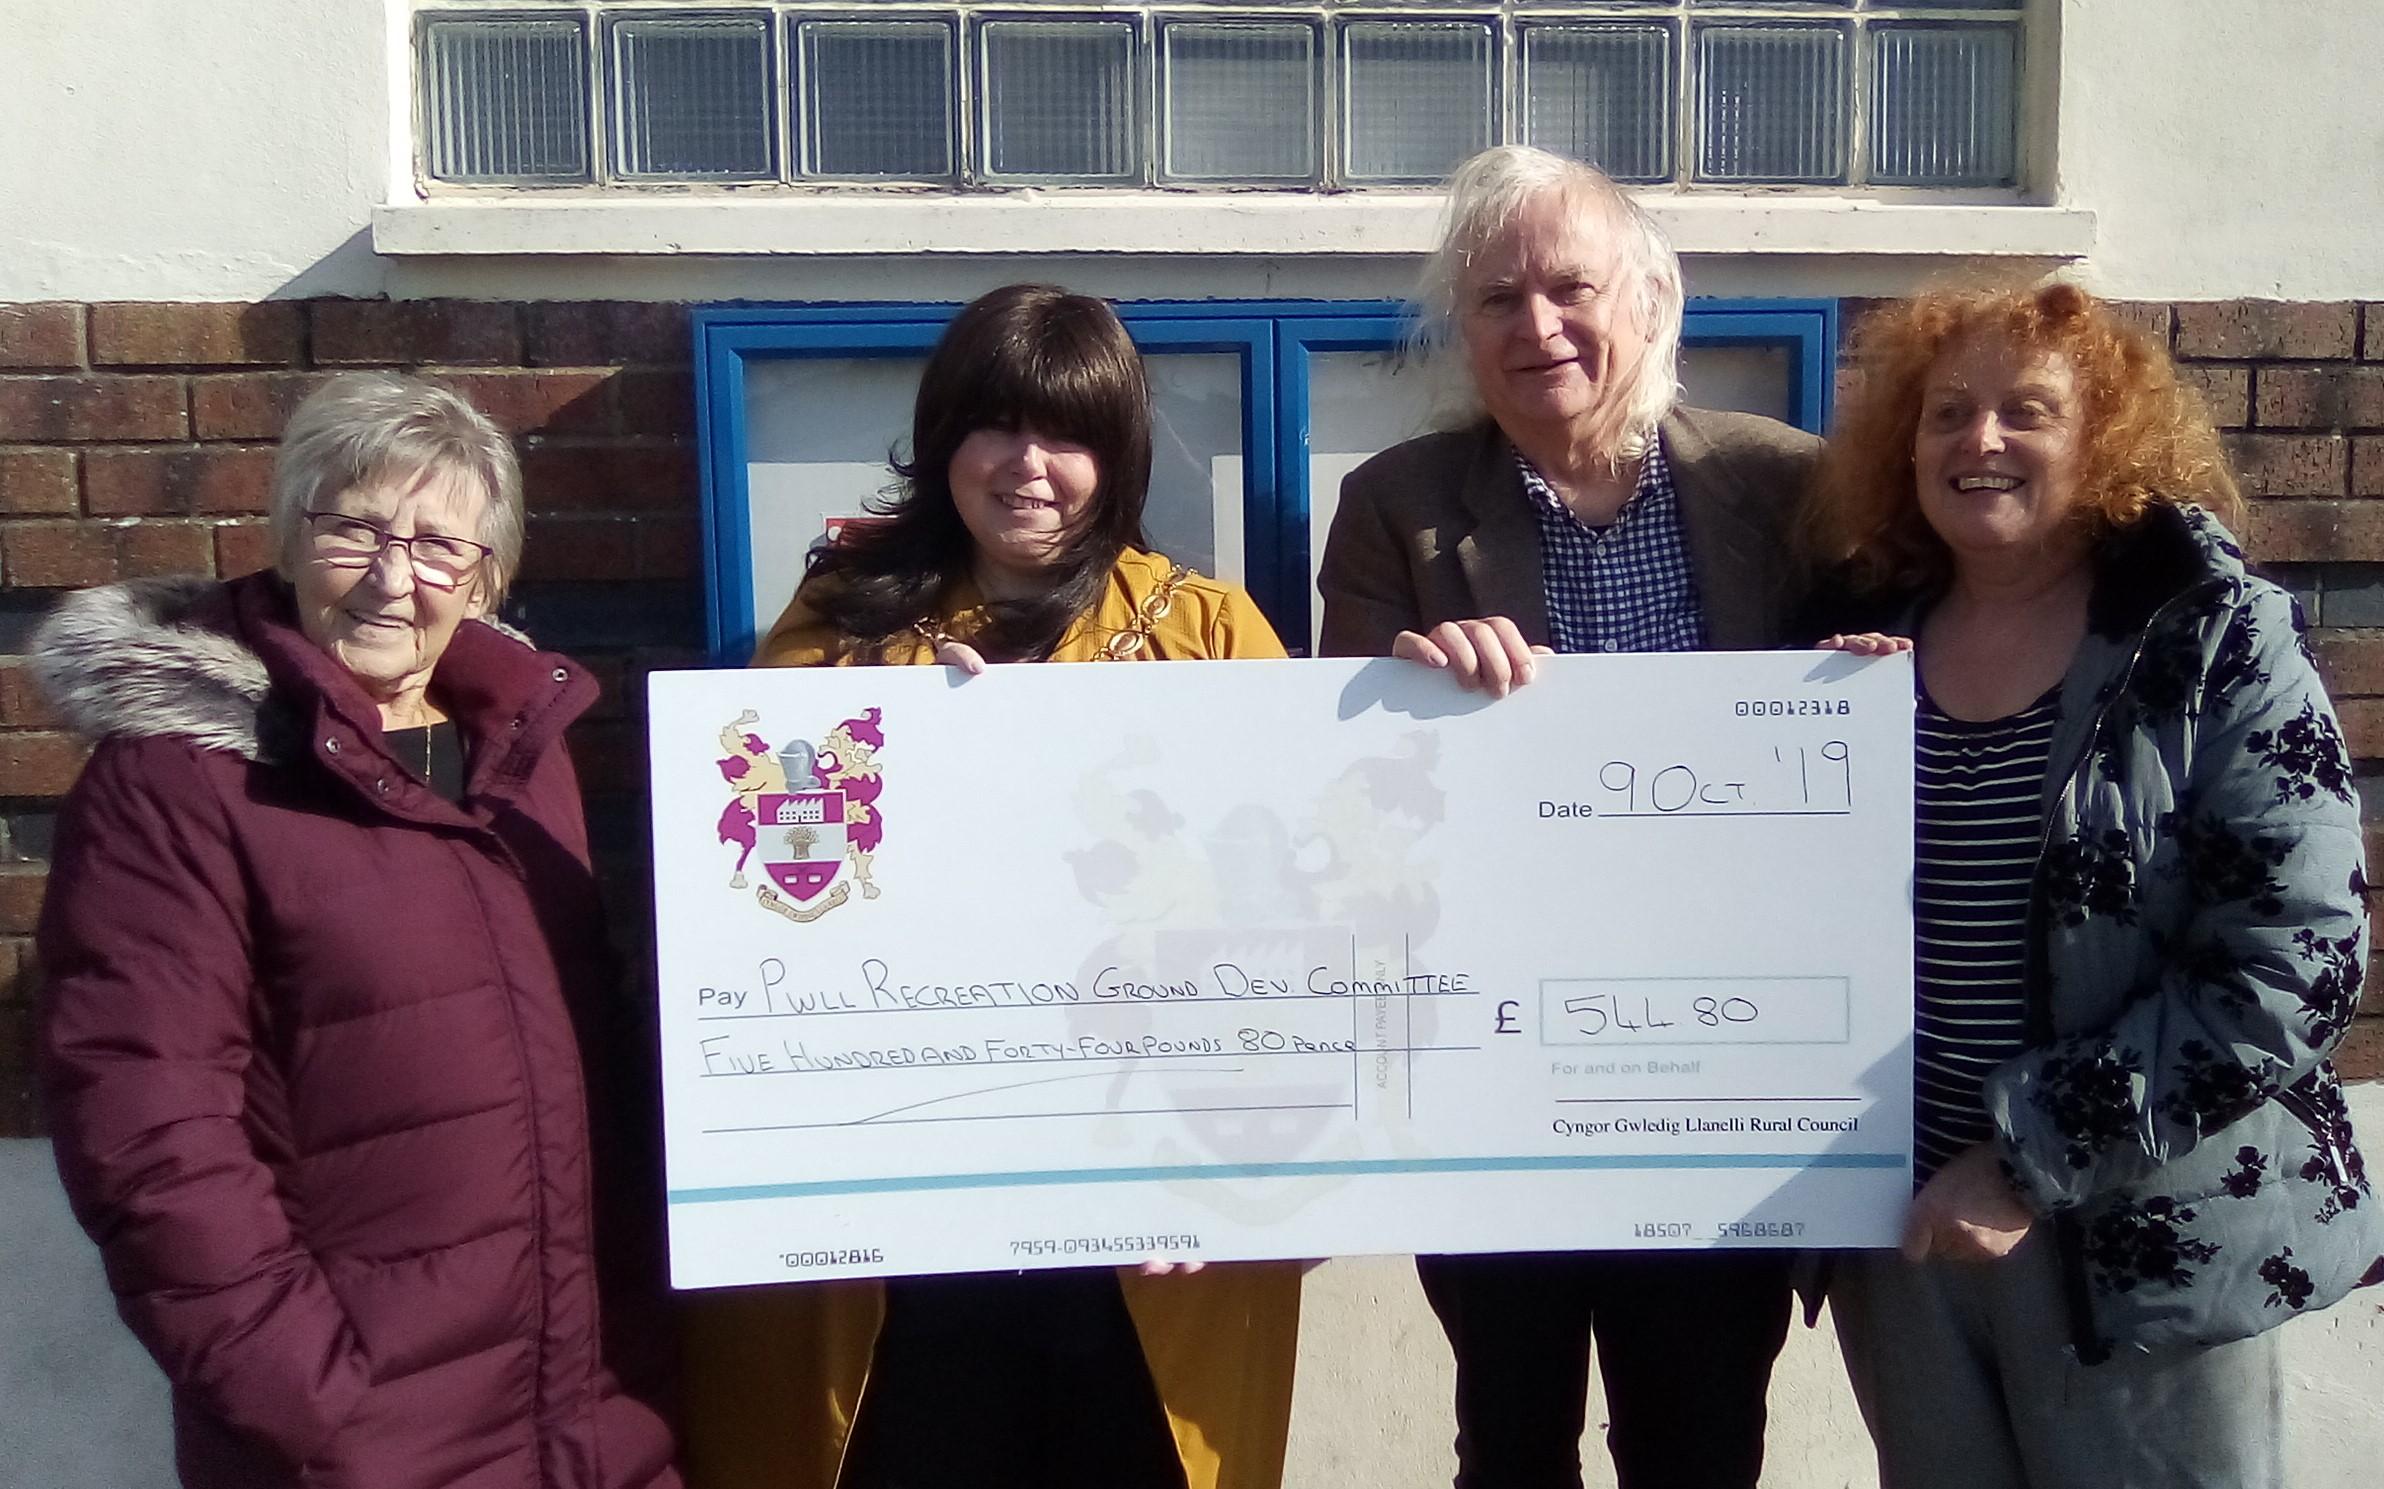 Pwll Recreation Ground Development Committee – Community Development Grant